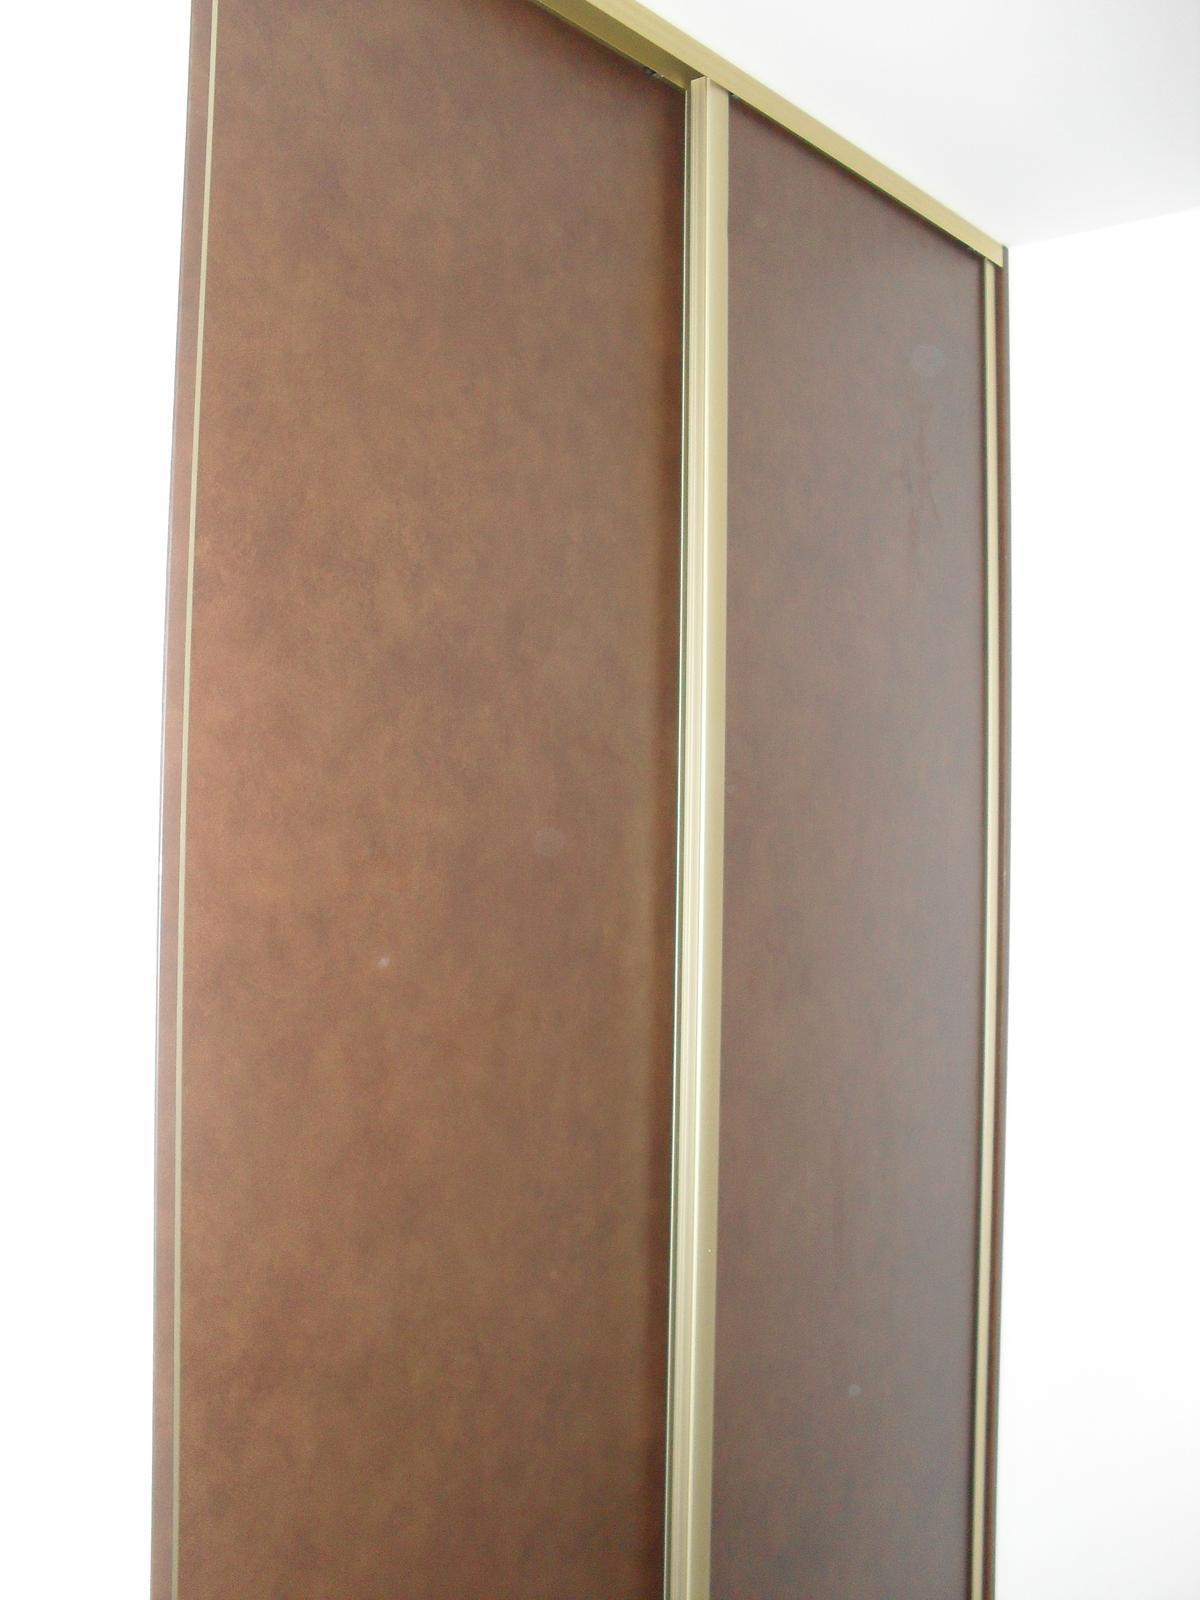 Vstavané skrine Martin Benko Bošany - Obrázok č. 55